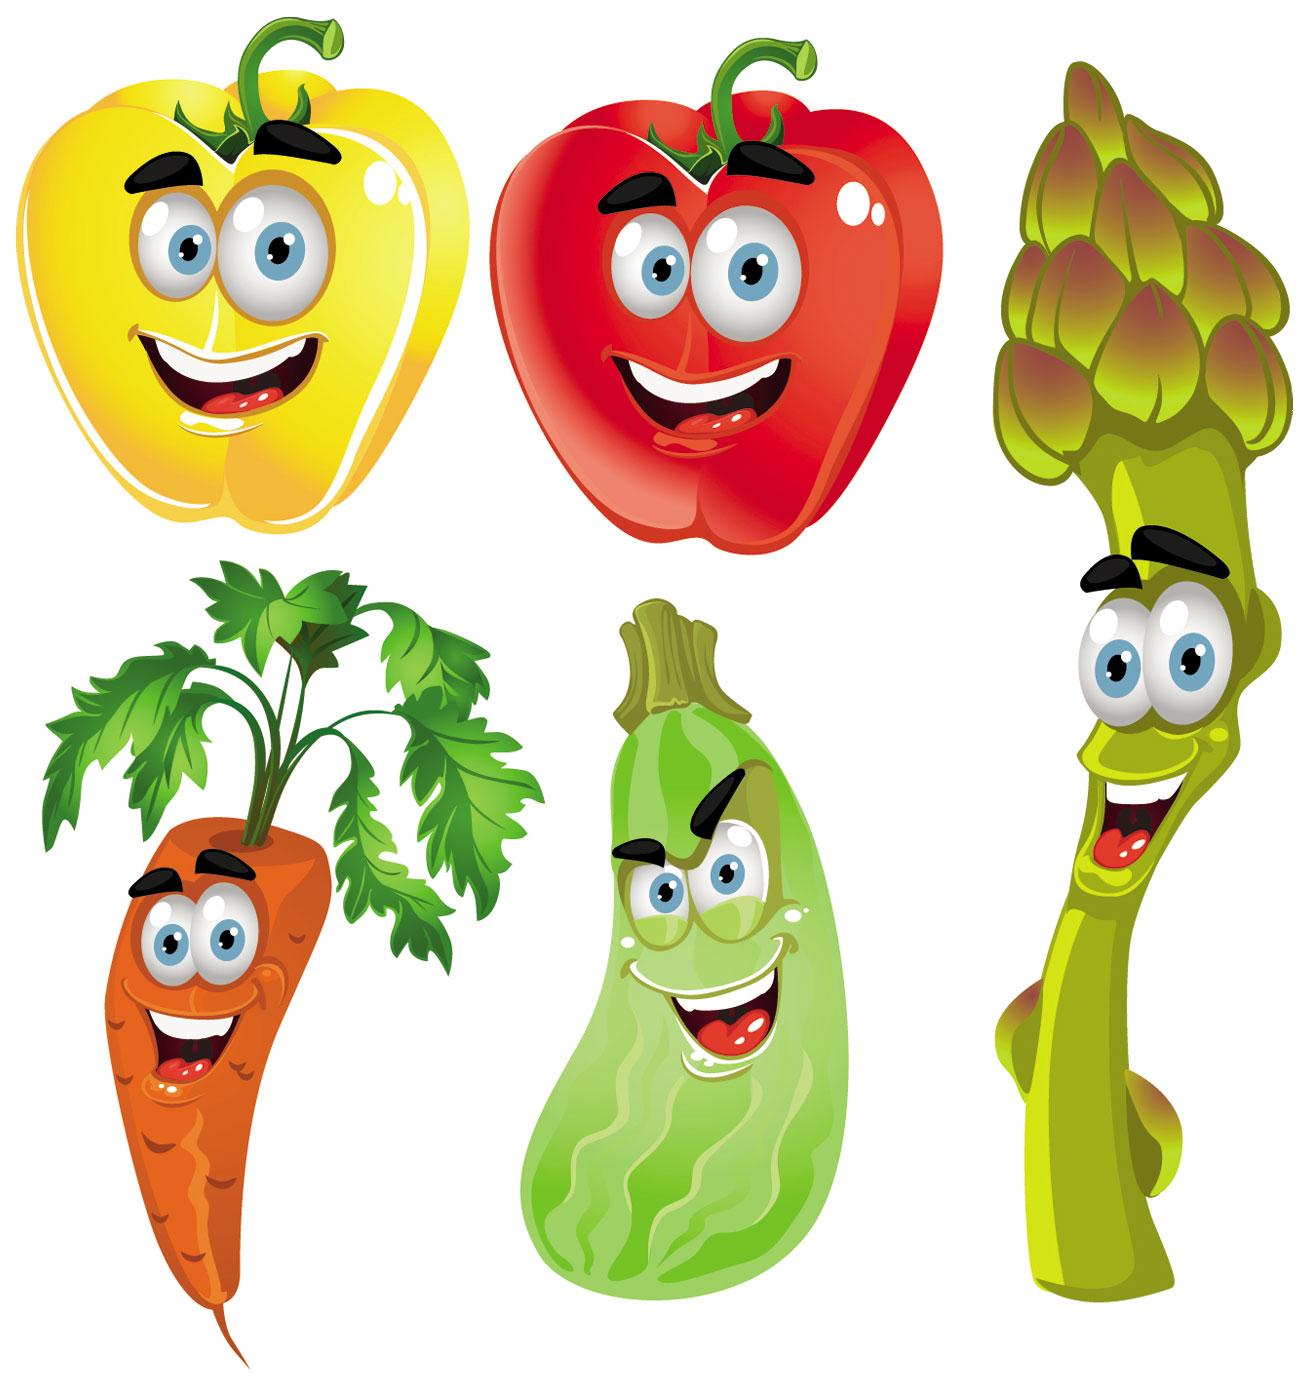 Veggie drawings at paintingvalley. Clipart vegetables vegy